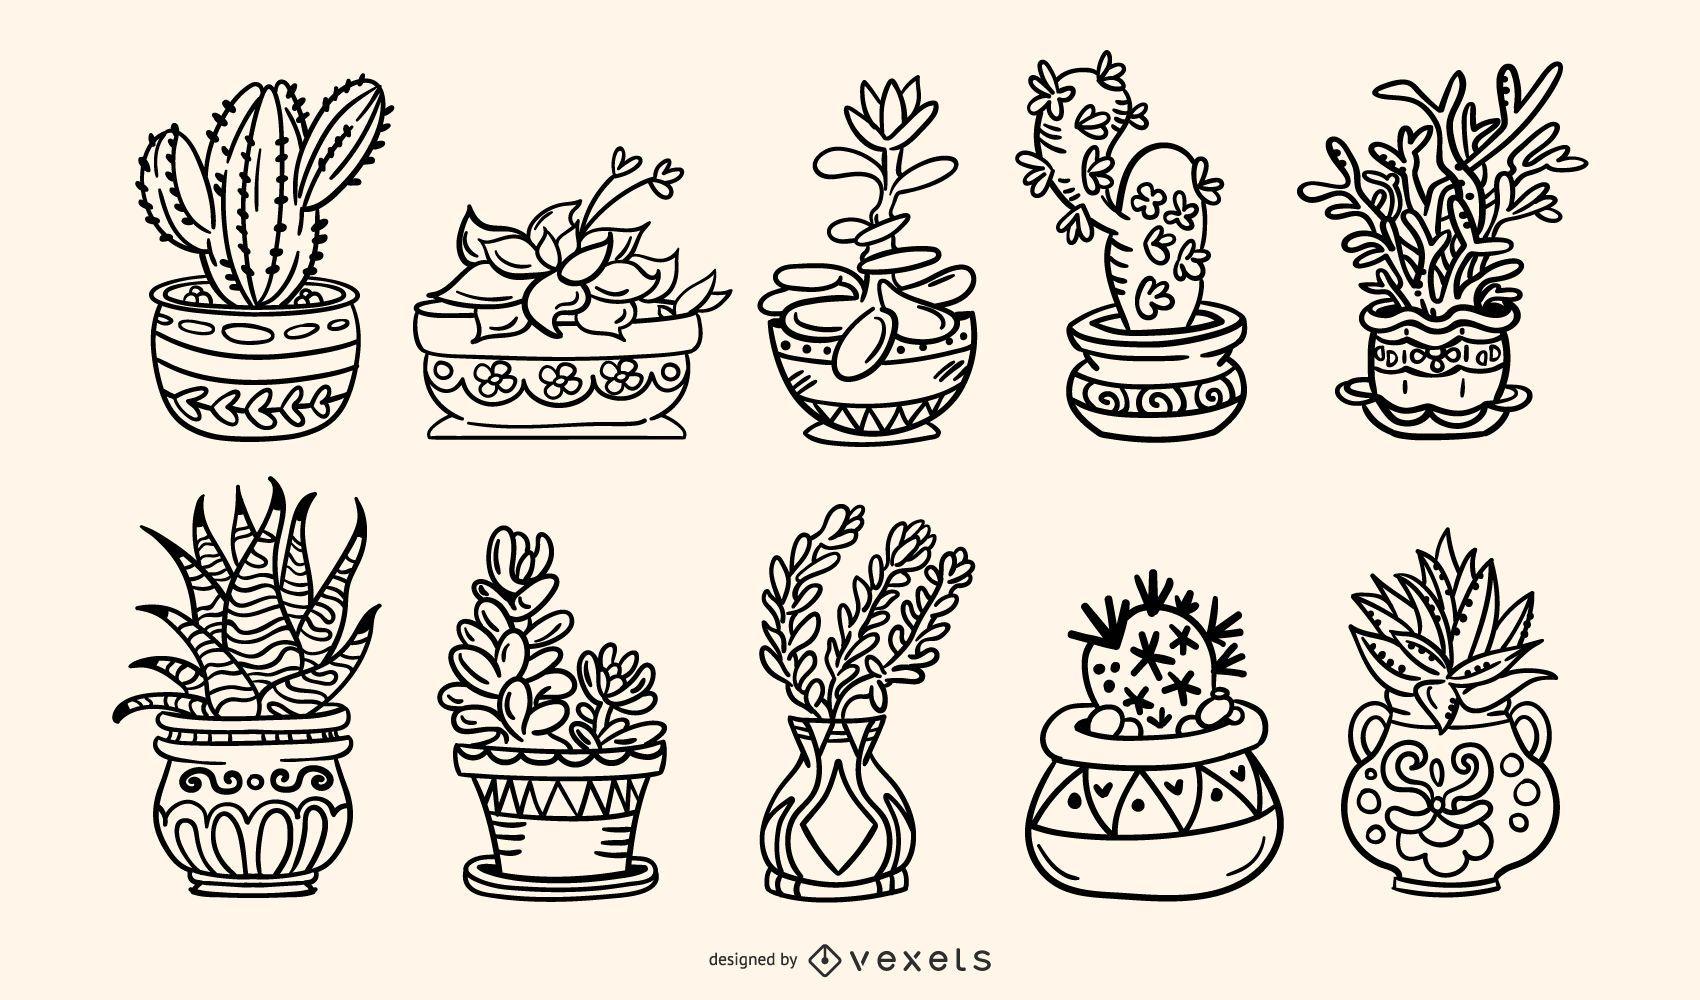 Succulent Plants Handdrawn Stroke Illustration Pack